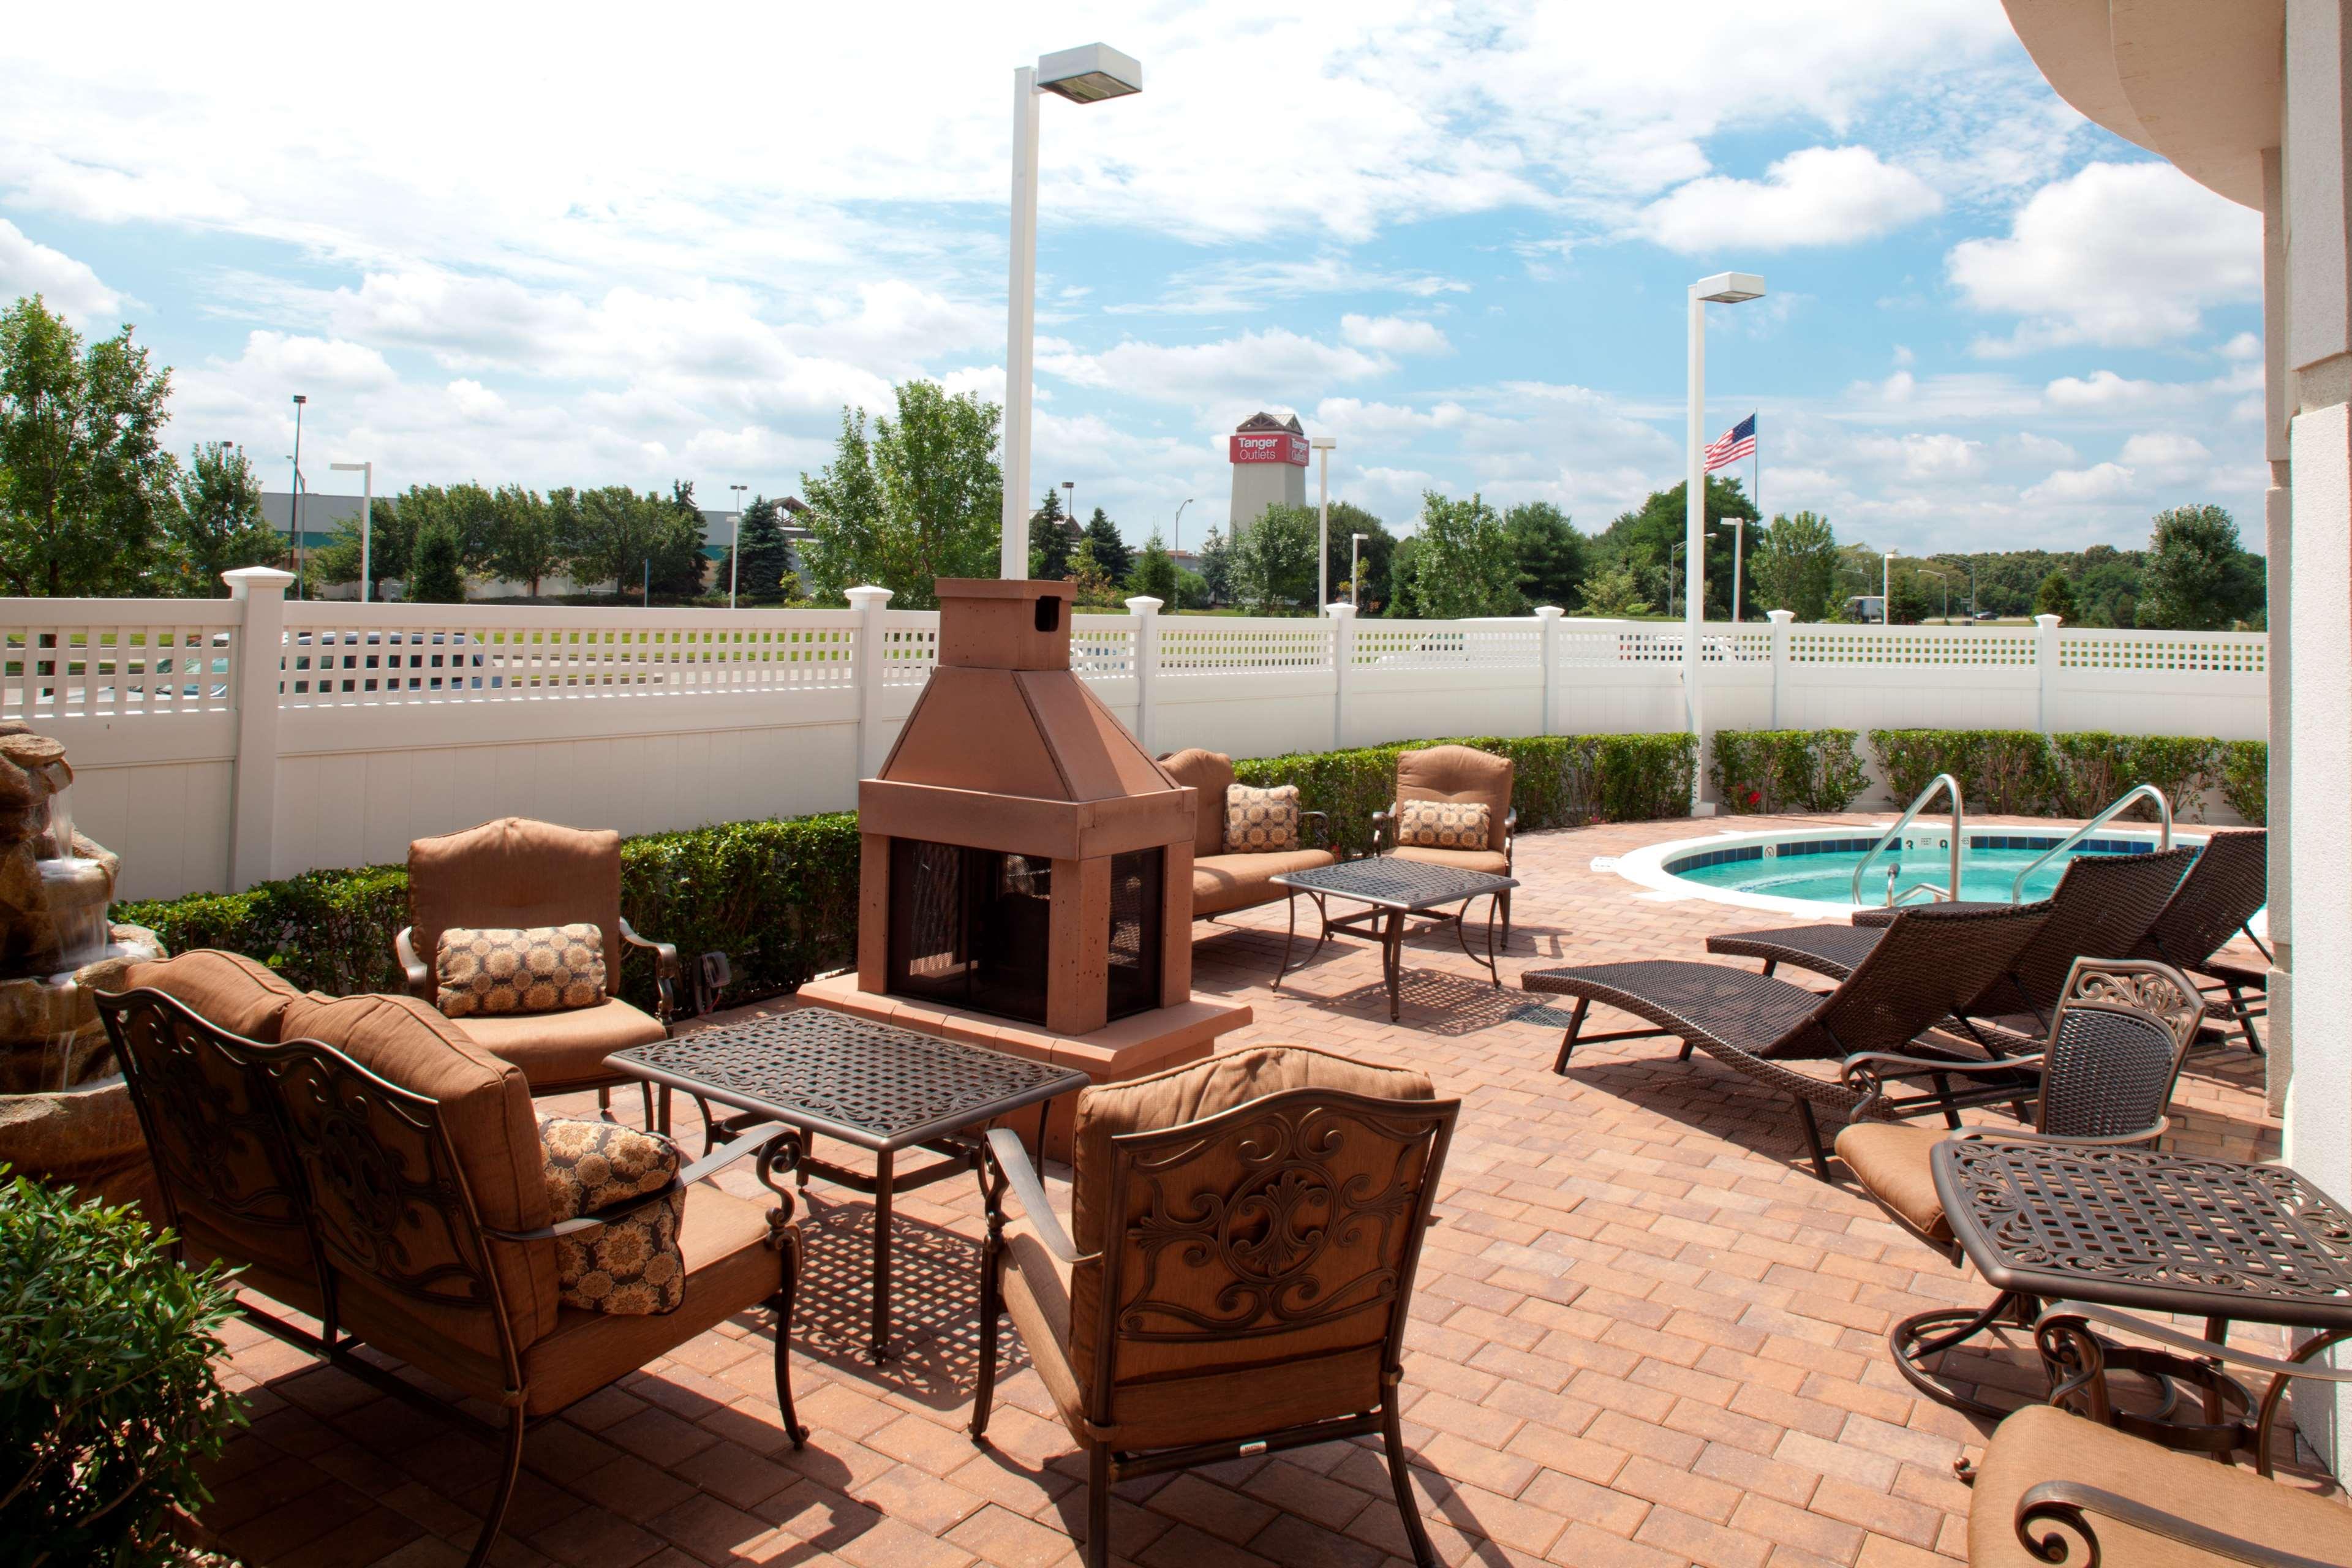 Hilton Garden Inn Riverhead image 20